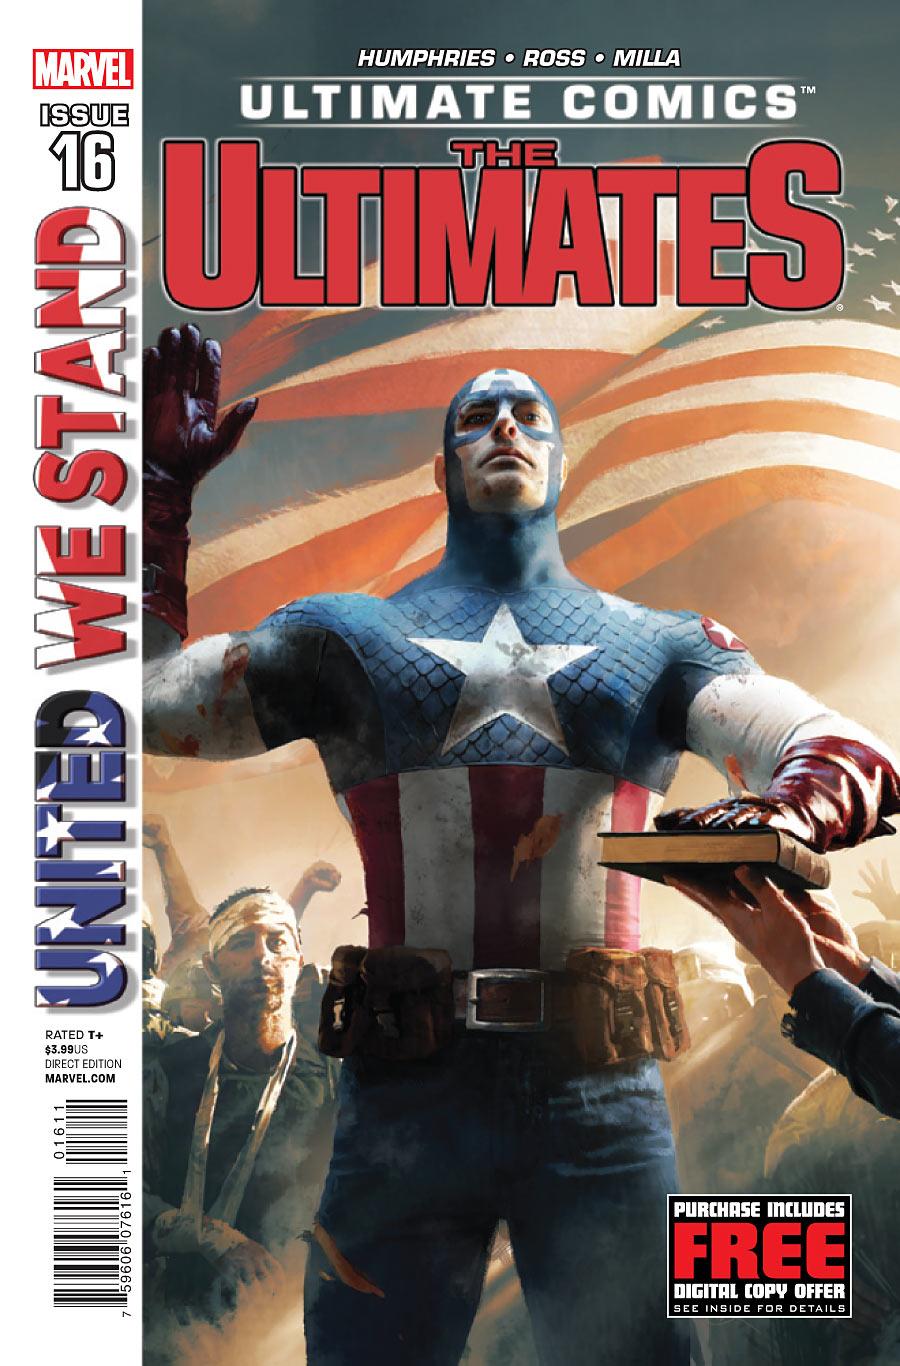 Ultimate Comics: The Ultimates #16